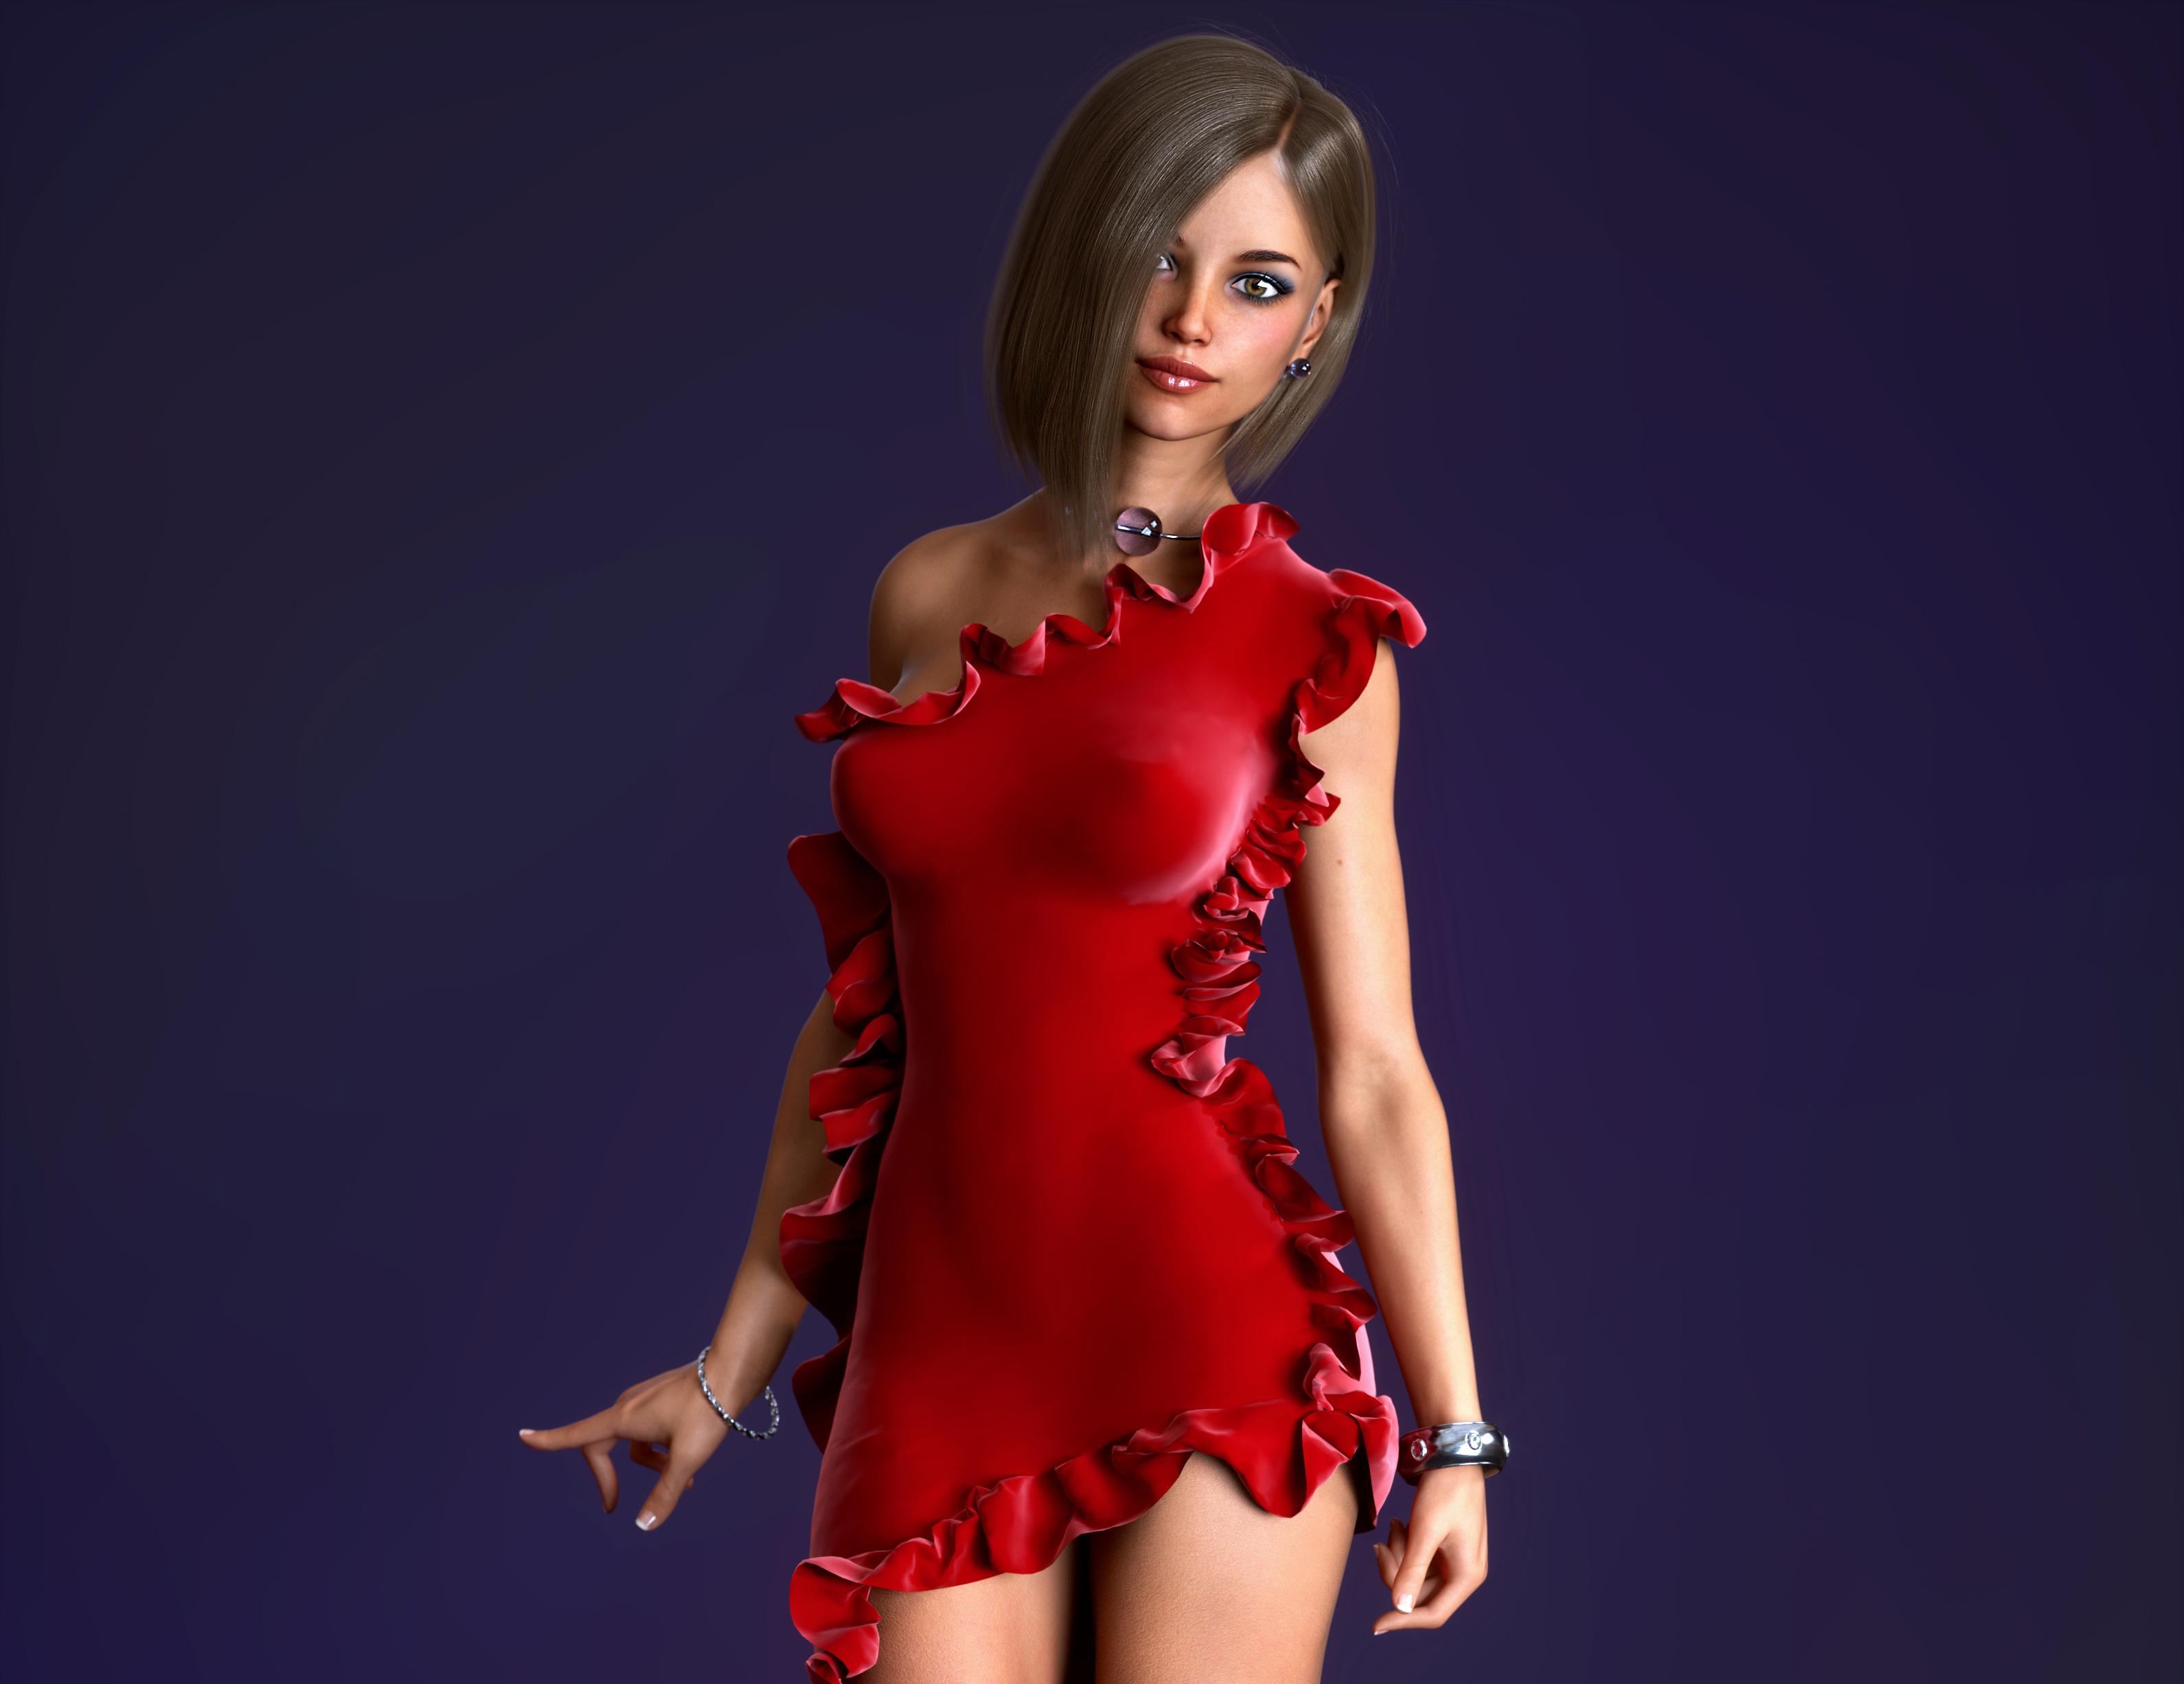 Red Dress Girl 3D Cgi 4k, HD Artist, 4k